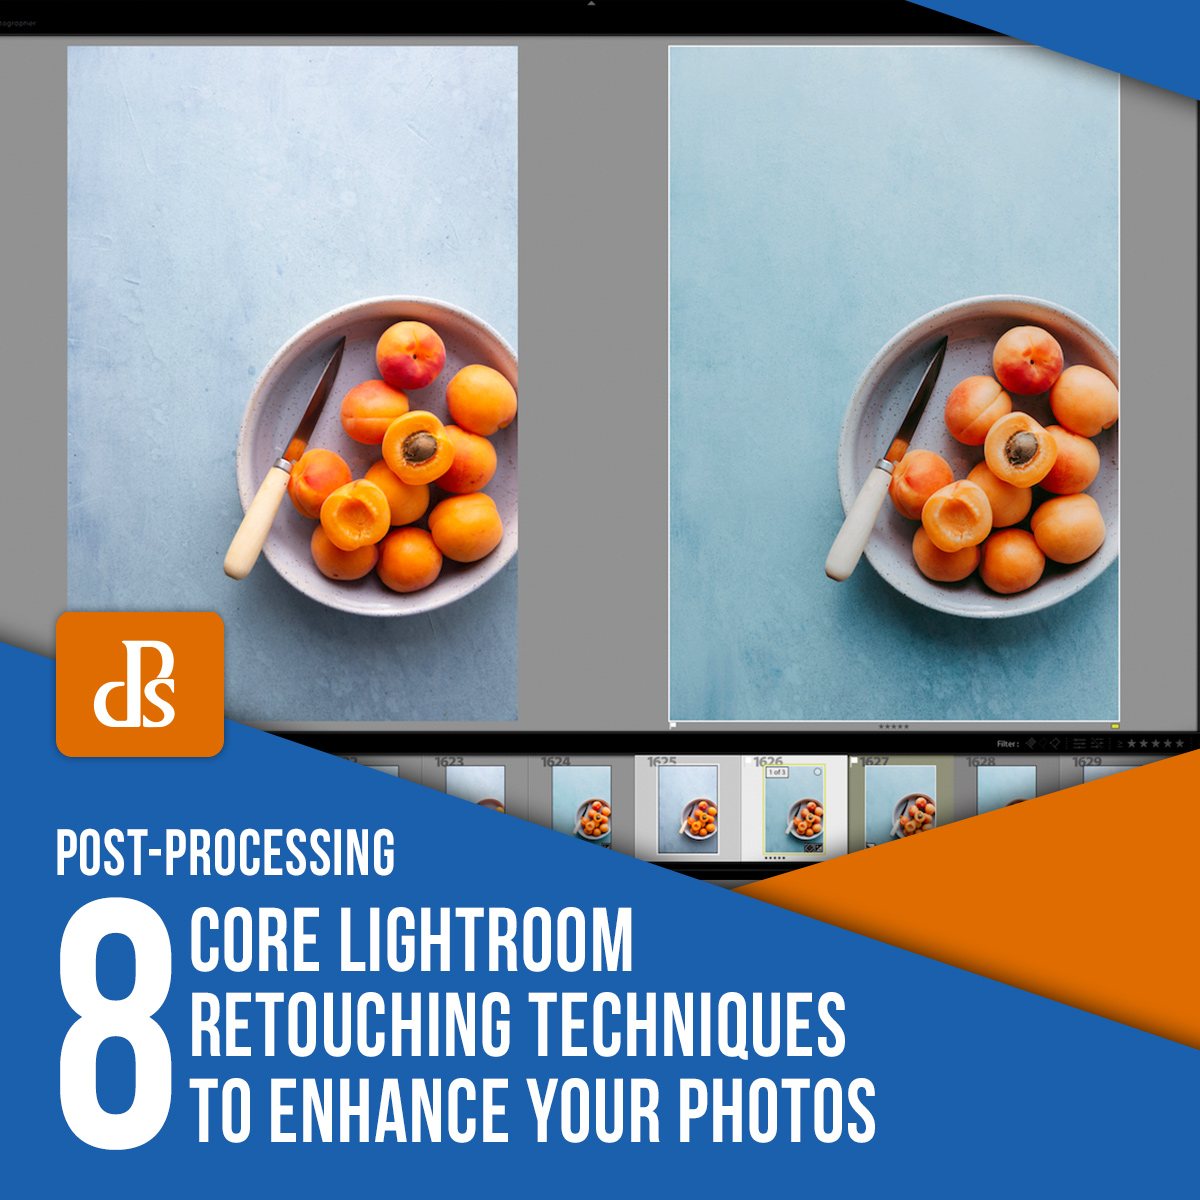 8 Core Lightroom Retouching Techniques to Enhance Your Photos